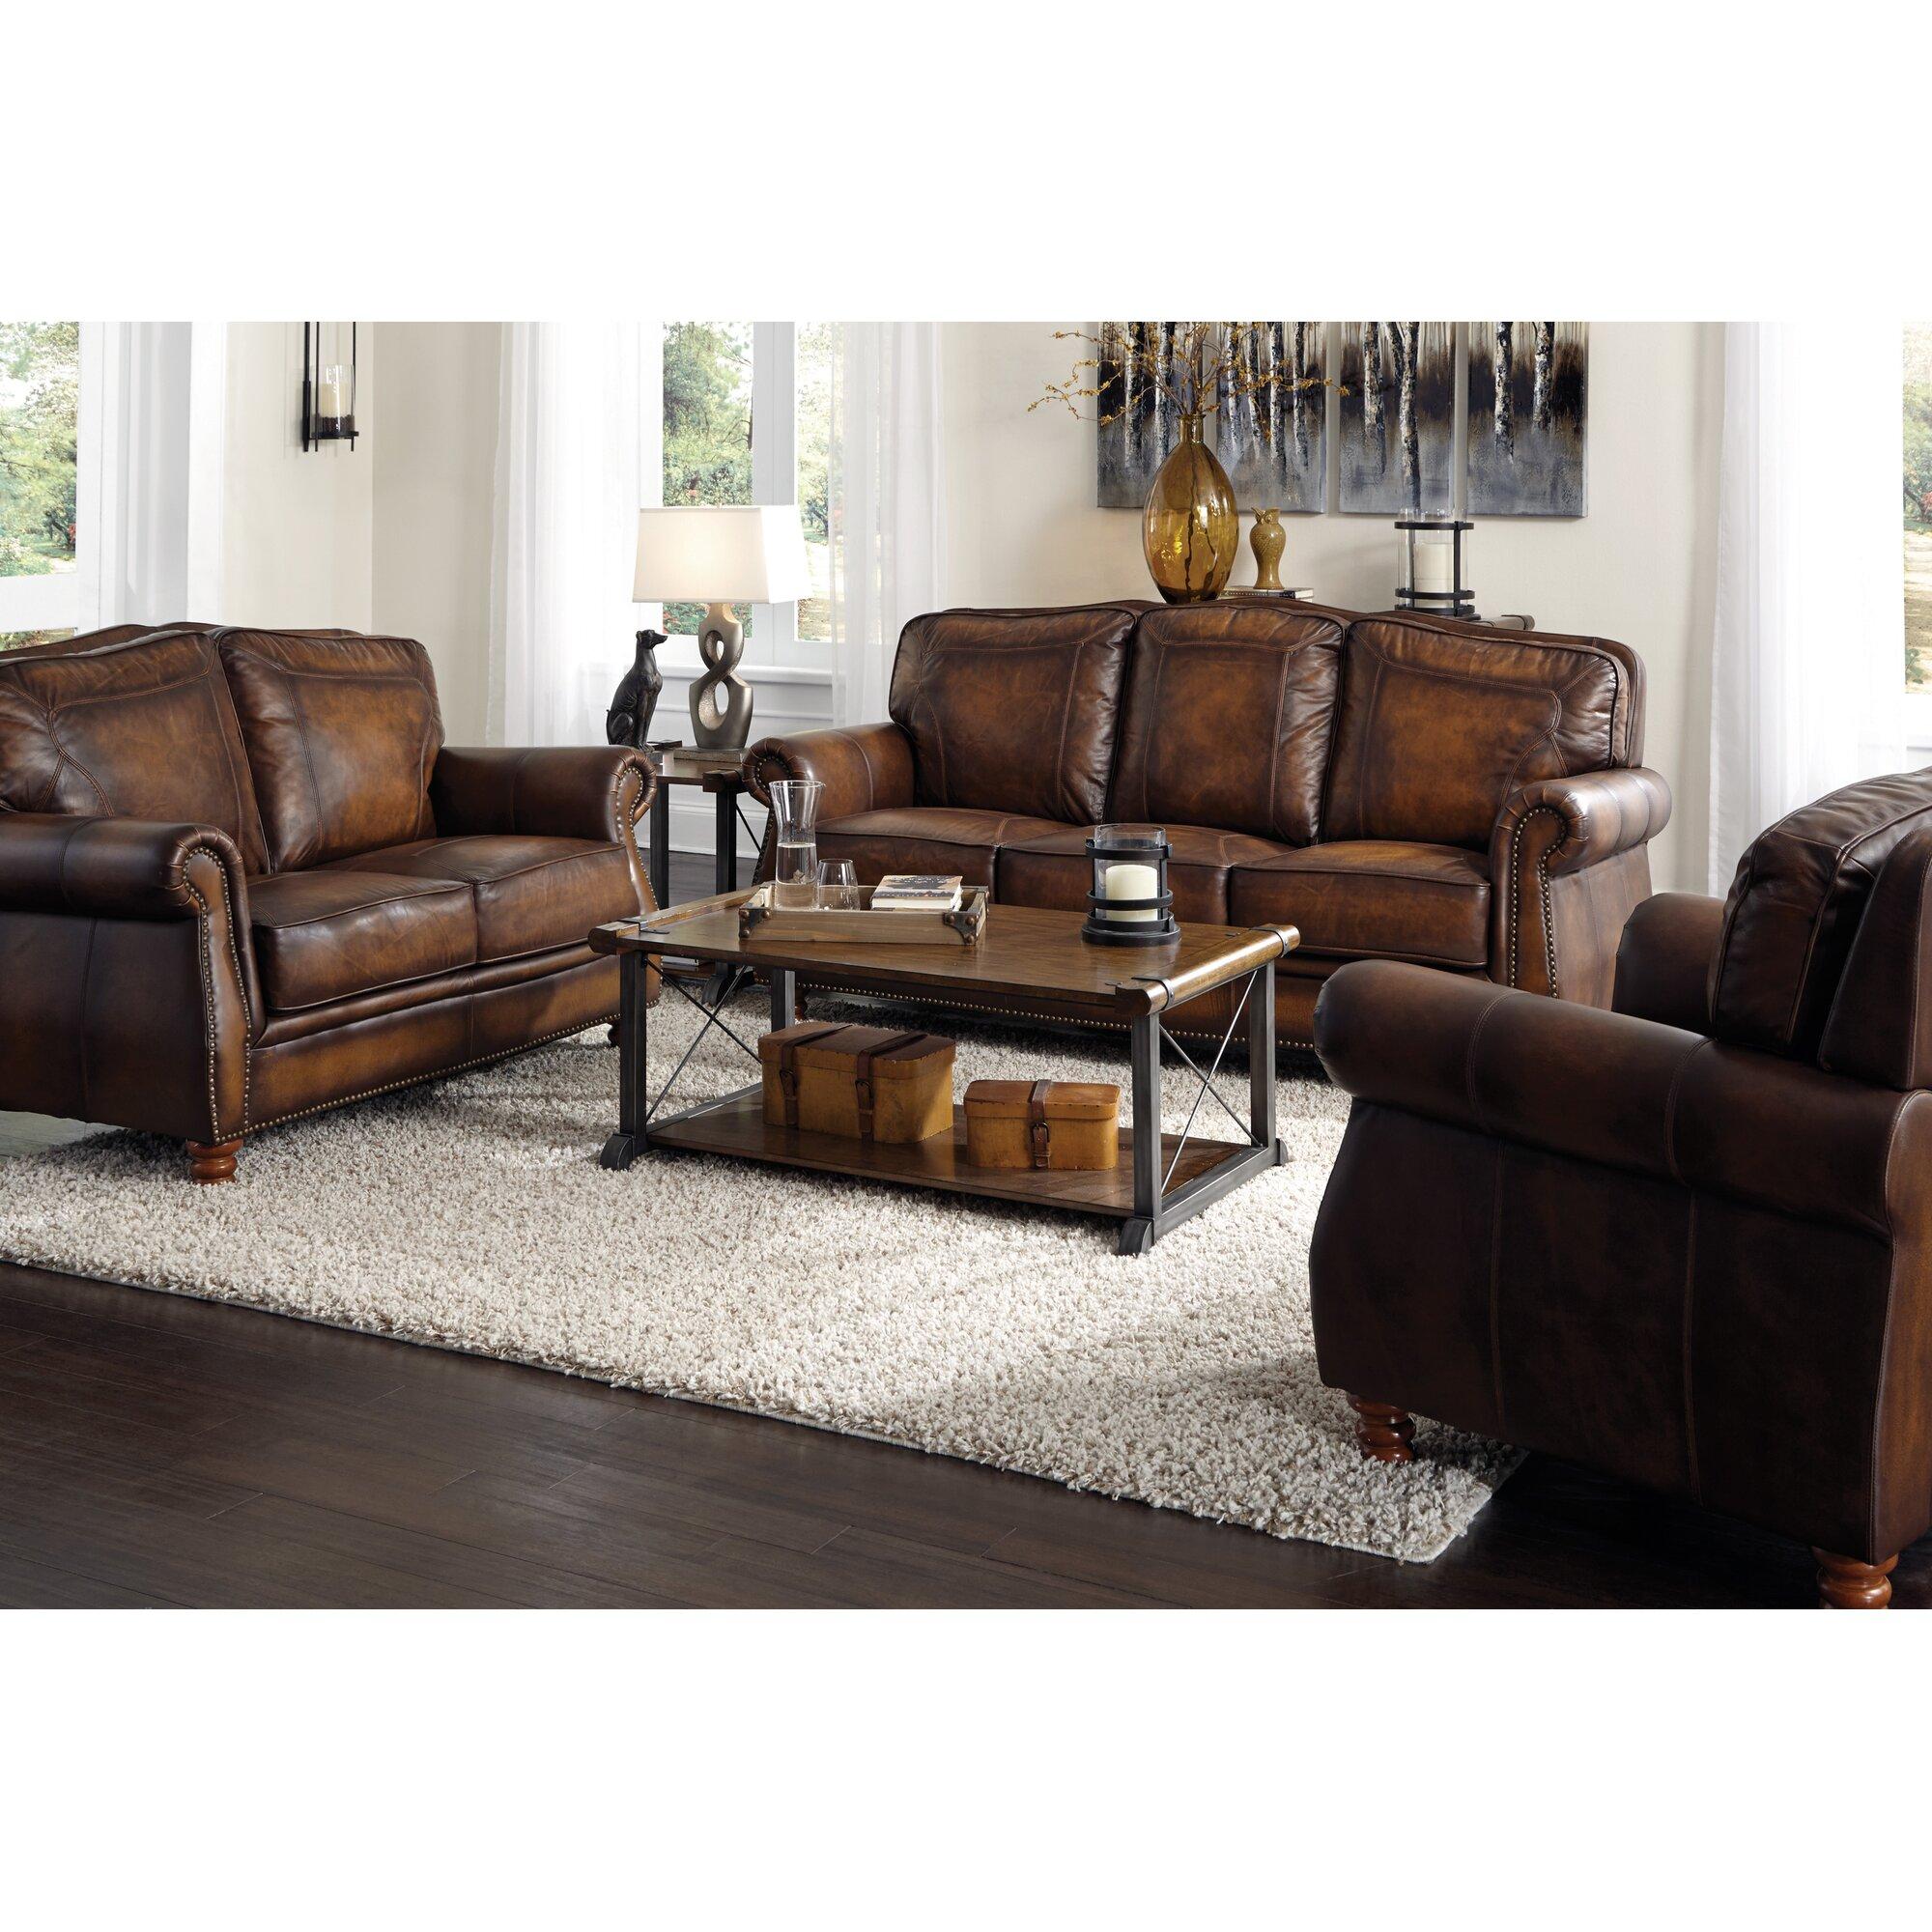 Emejing Living Room Club Chairs Photos - Decorating Ideas ...